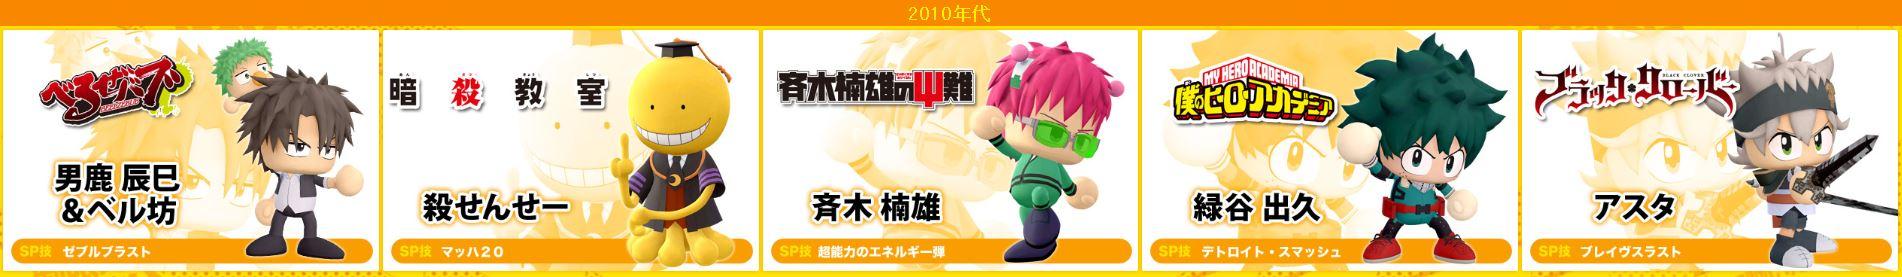 Weekly Shonen Jump: Jikkyou Janjan Stadium – Pre